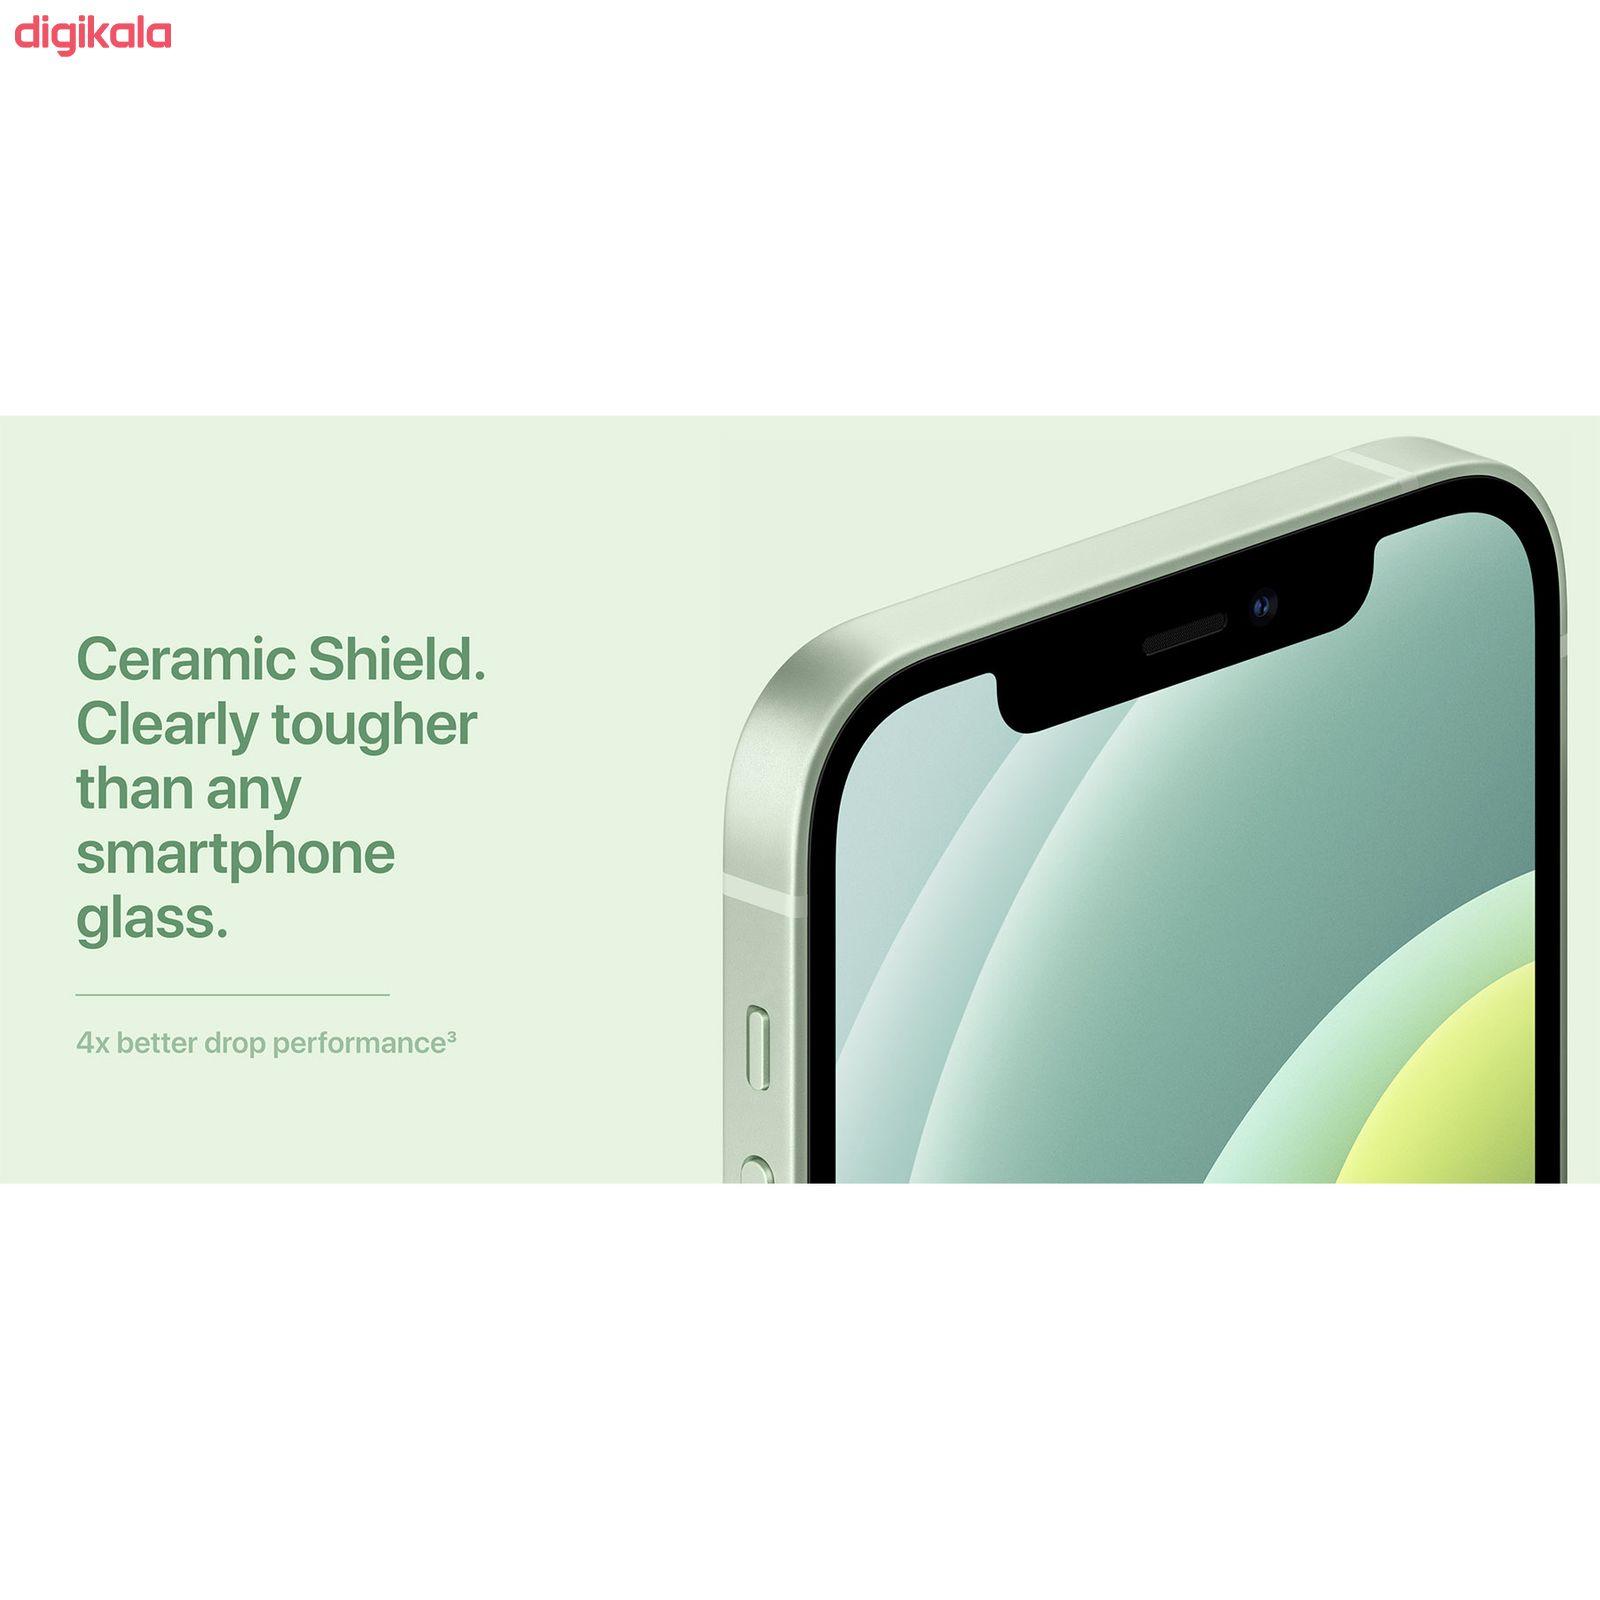 گوشی موبایل اپل مدل iPhone 12 A2404 دو سیم کارت ظرفیت 256 گیگابایت  main 1 15